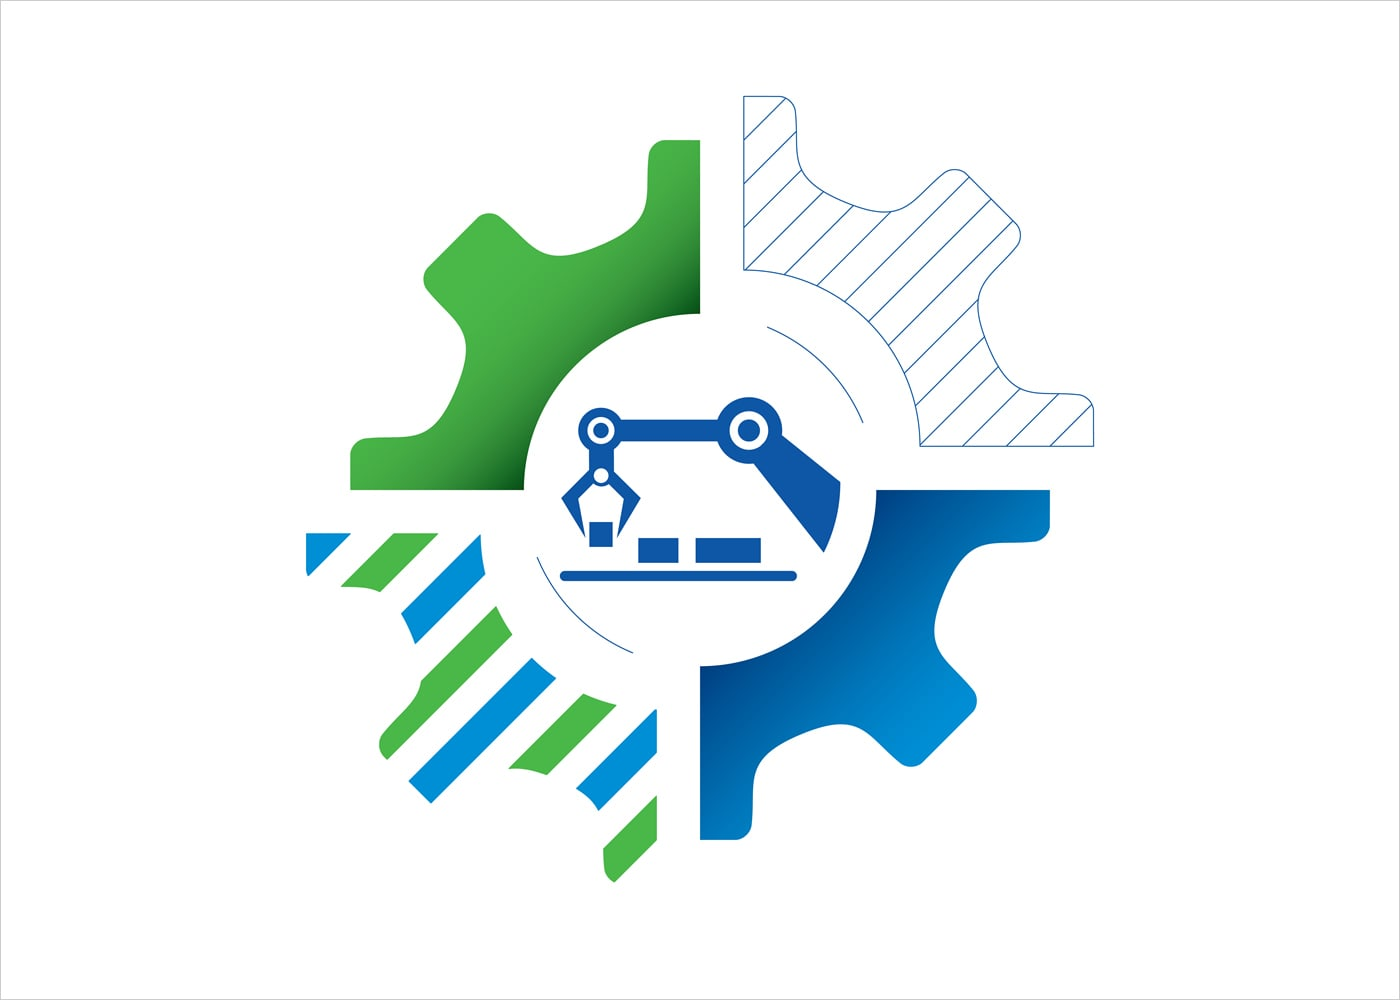 naem-webinar-2018-how-management-systems-achieve-next-generation-manufacturing-700x500